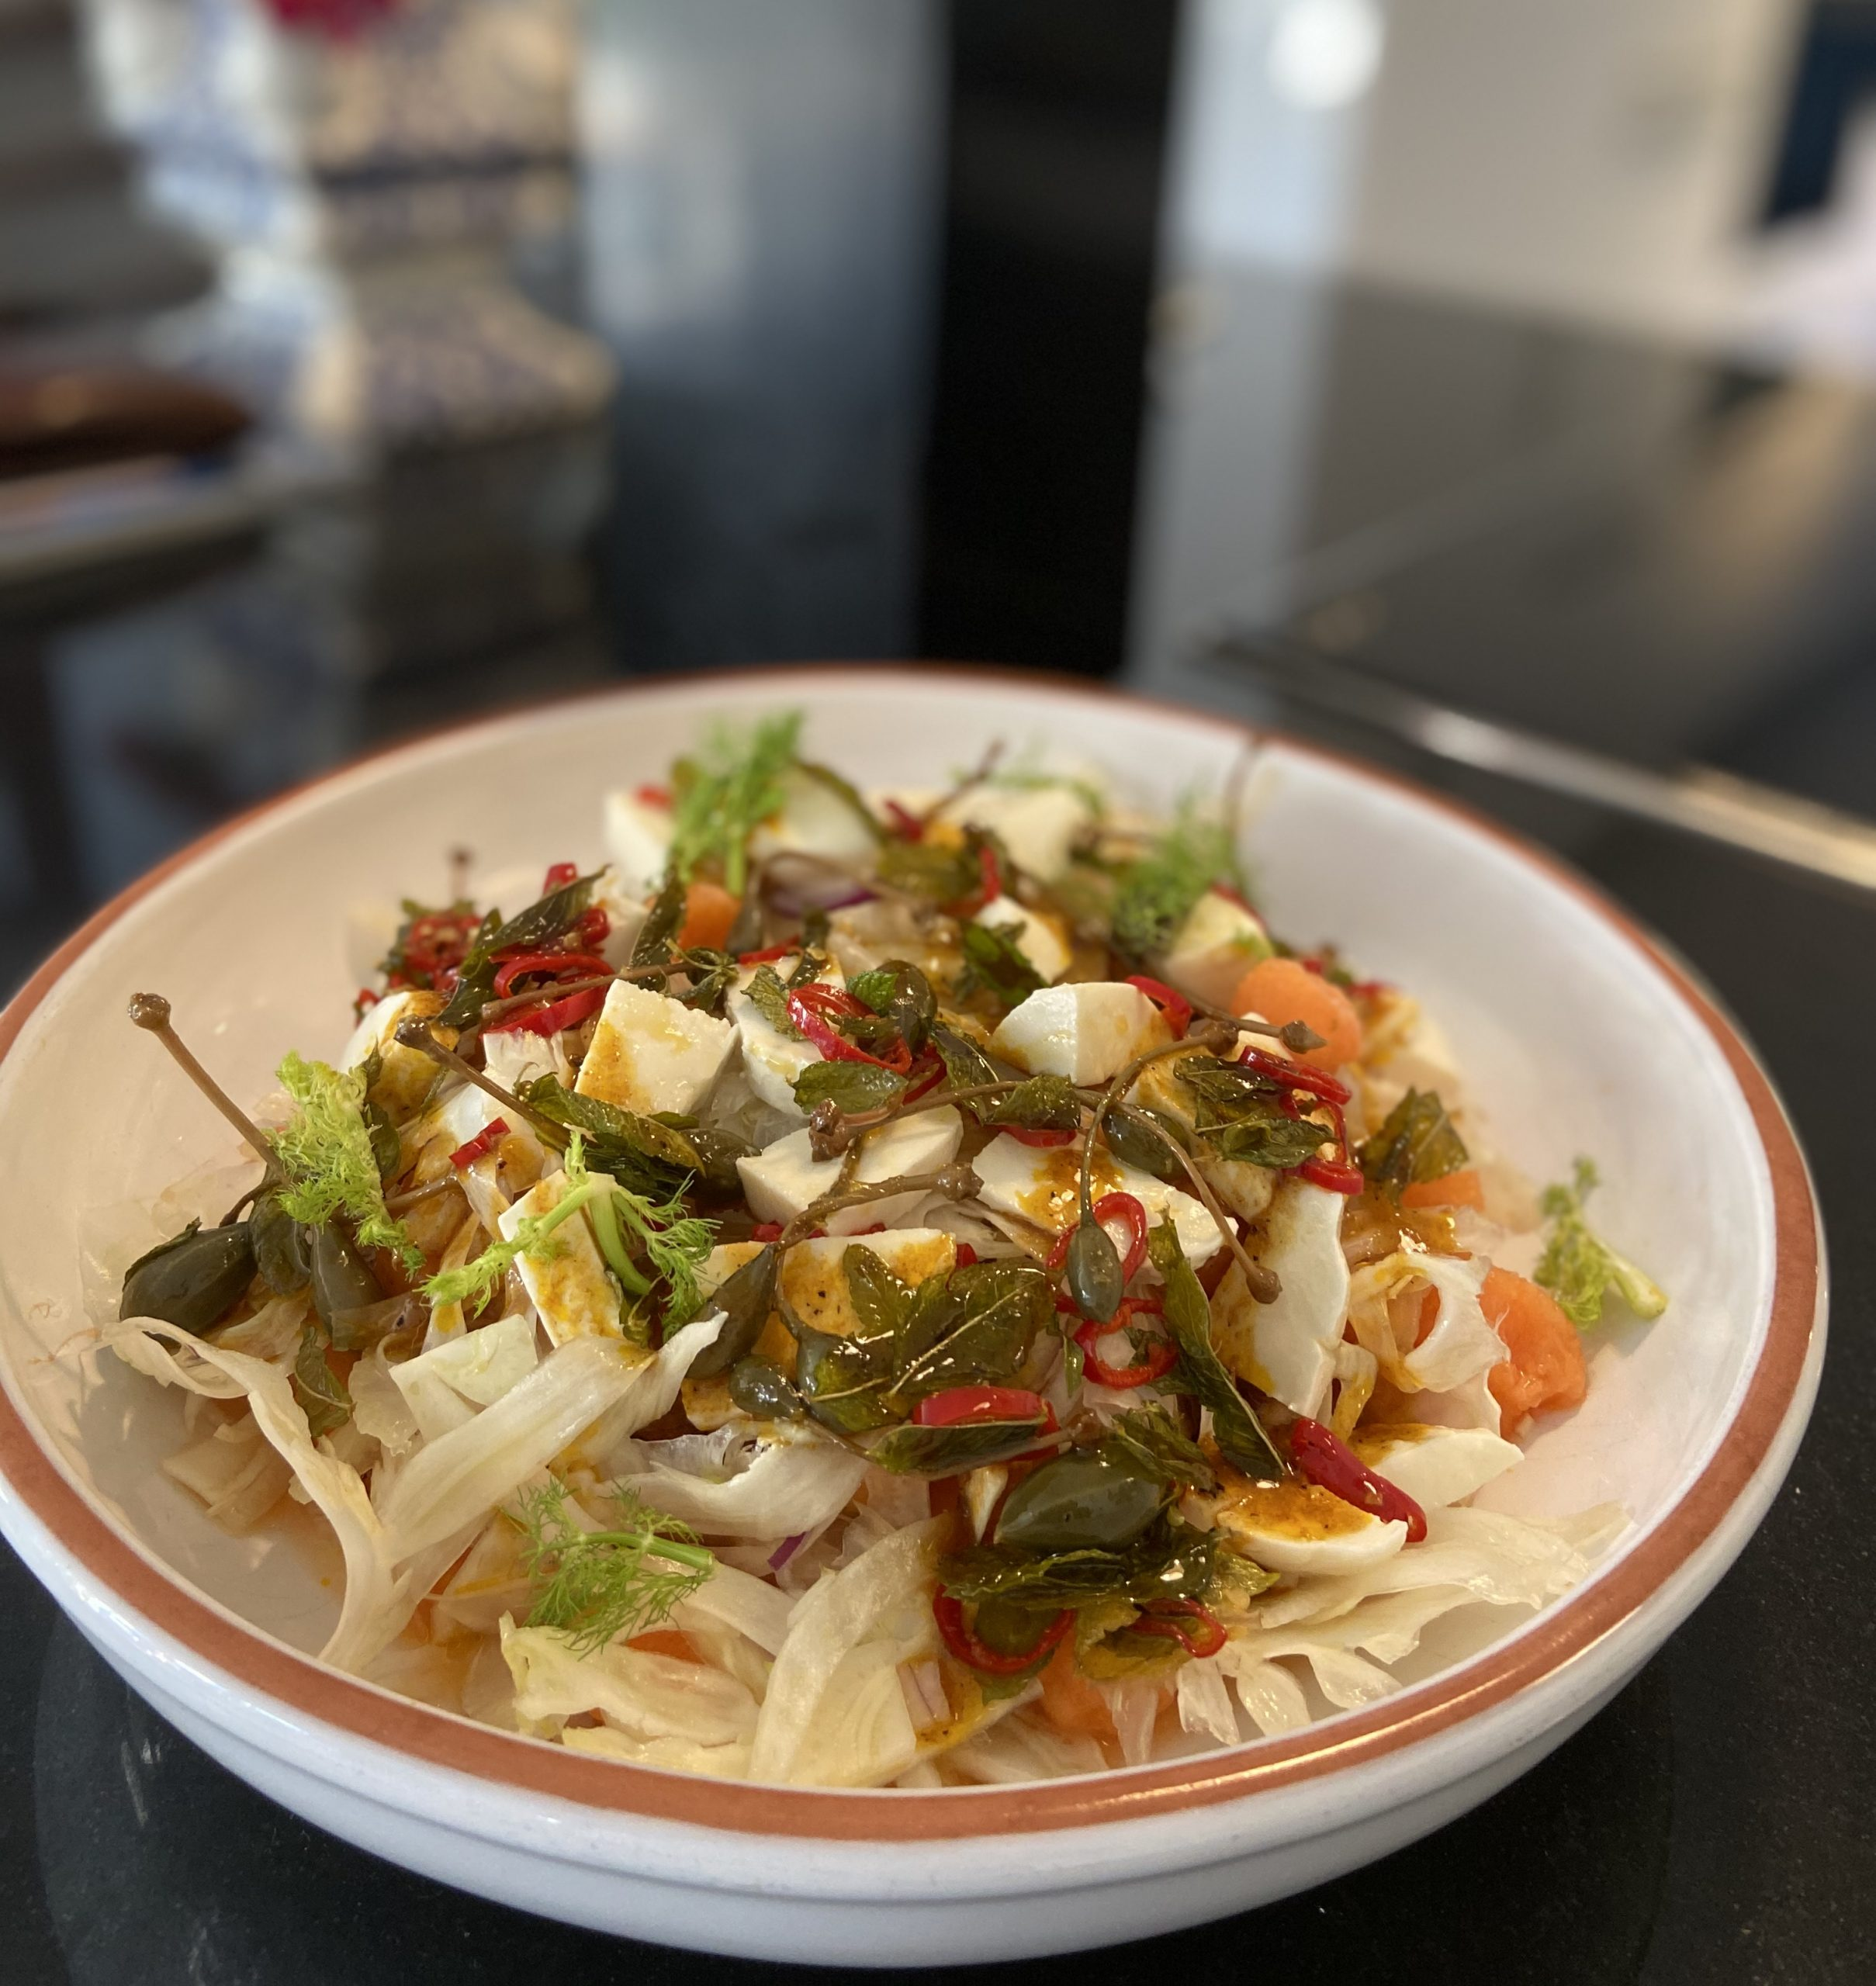 Salade met geschaafde venkel, meloen & mozzarella, knapperige kappertappeltjes, munt & rode pepertjes, sticky balsamicodressing